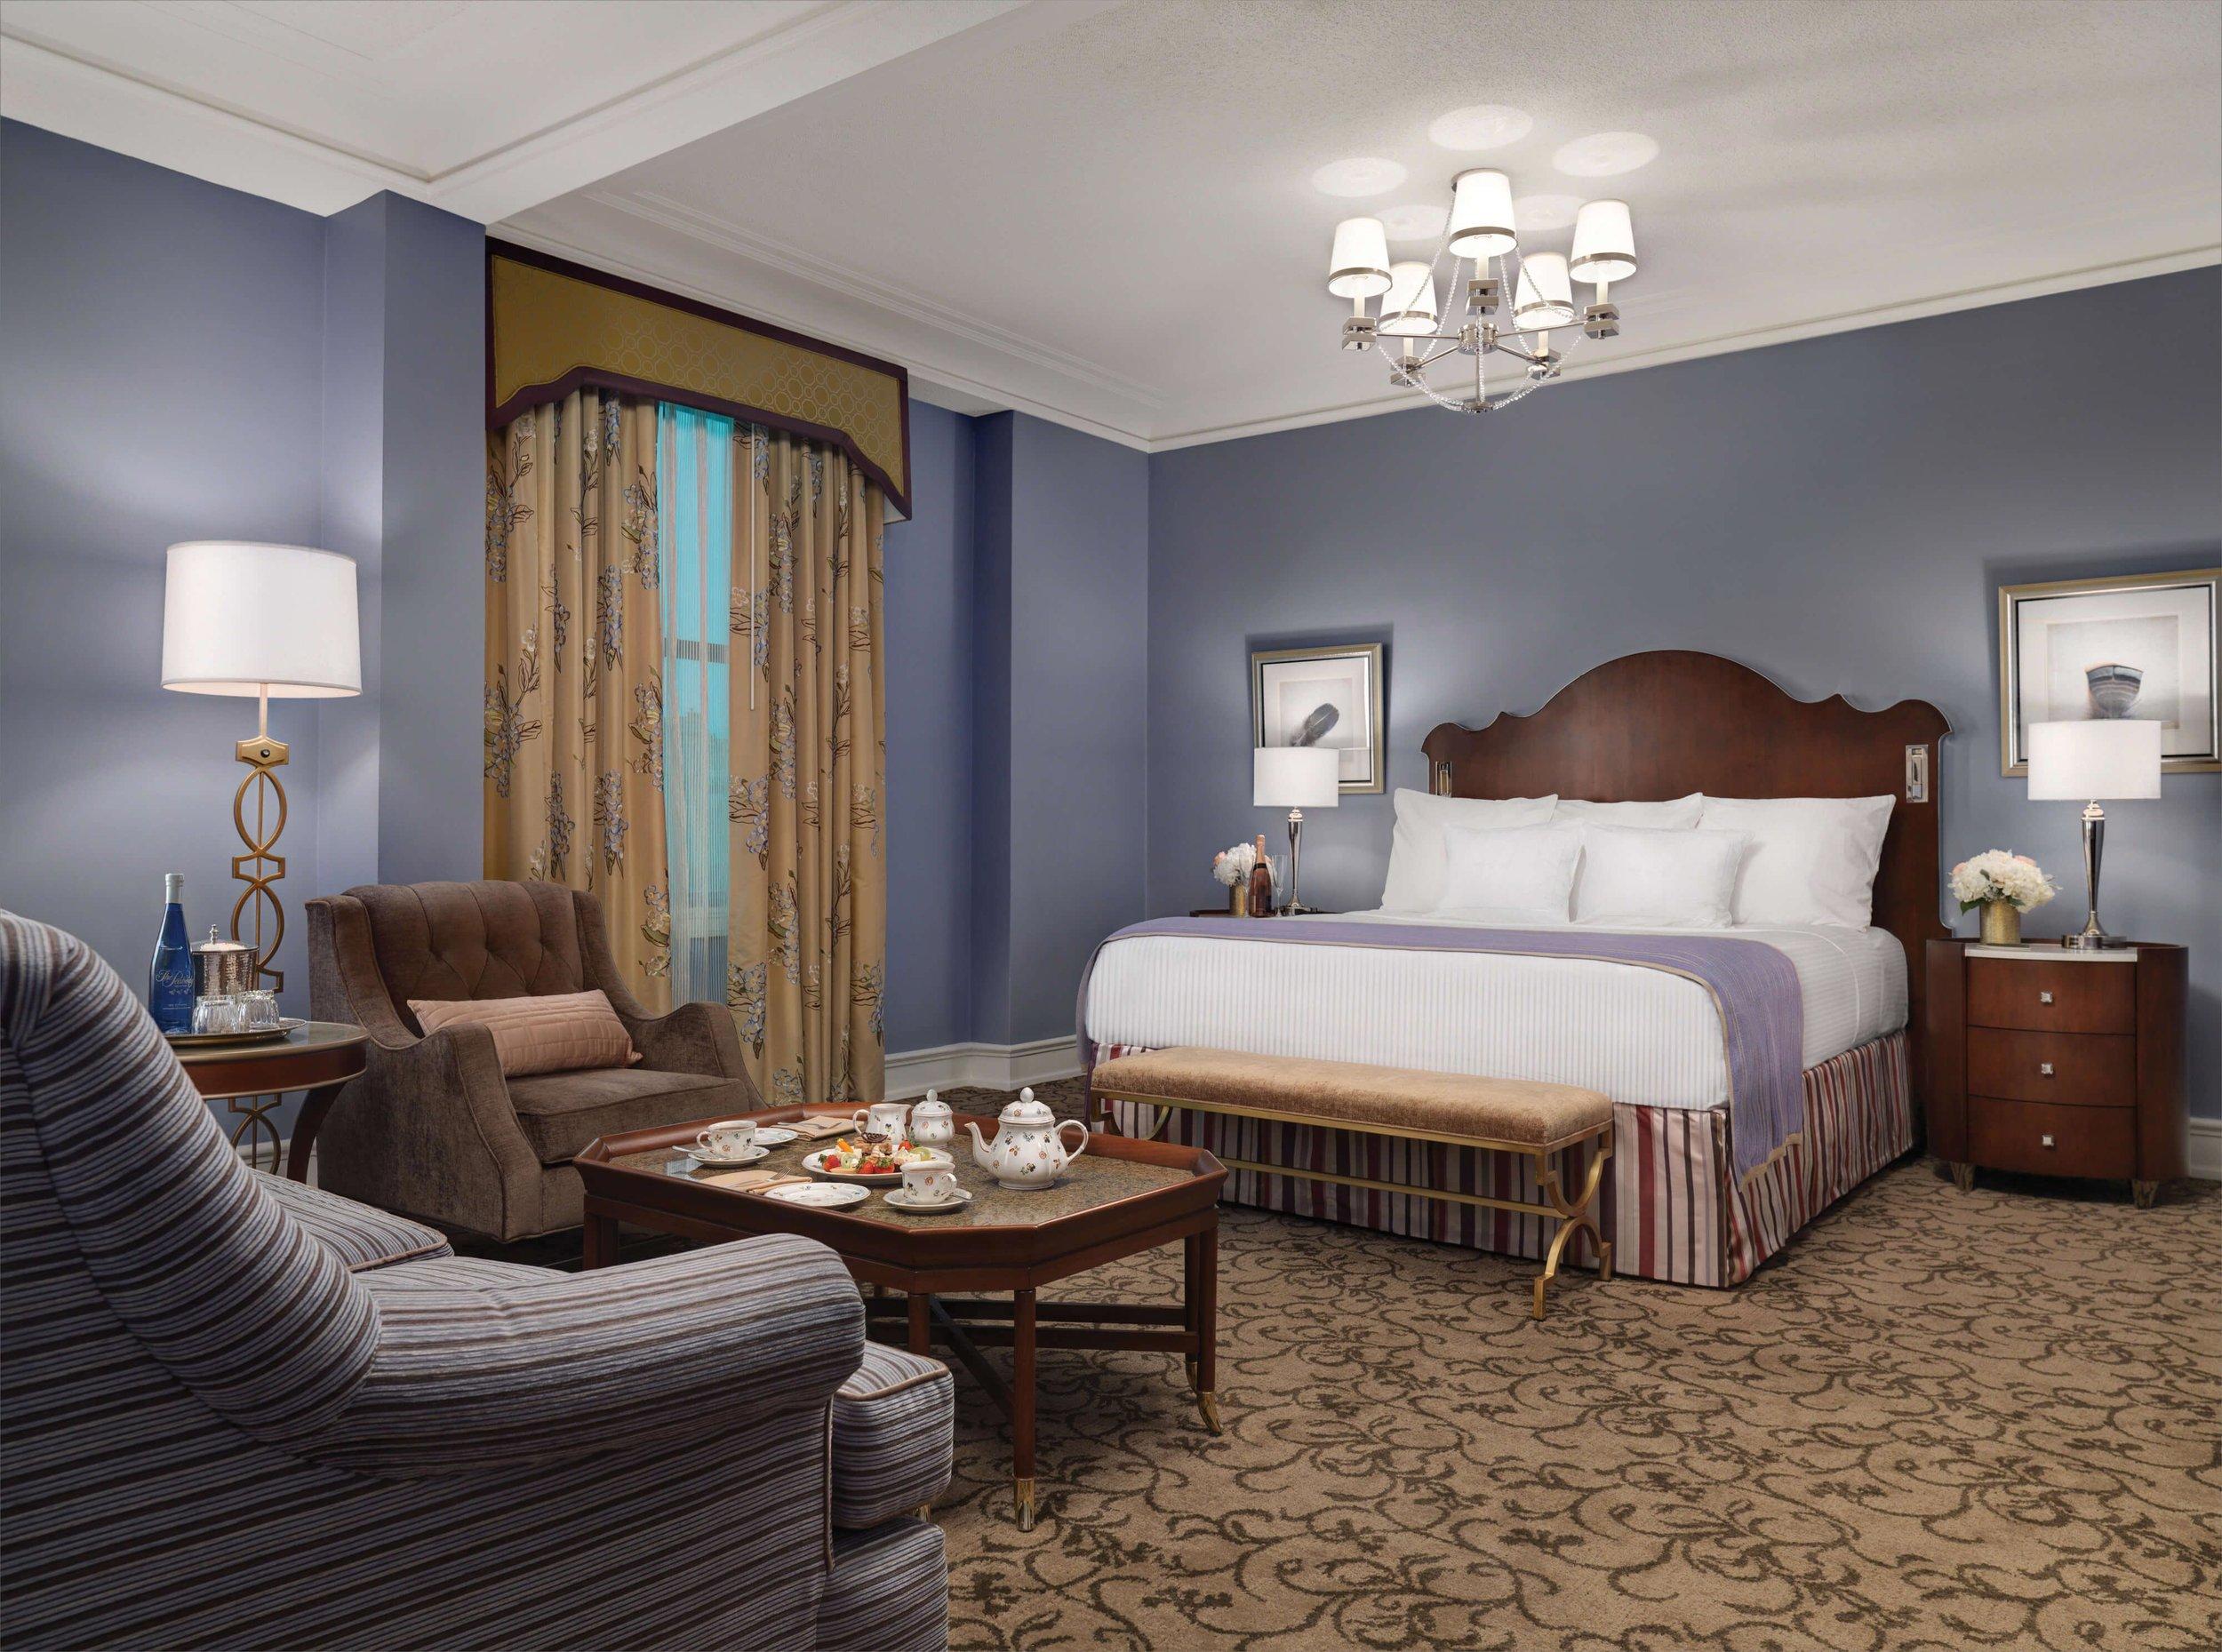 Peabody-Memphis-King-Guest-room.jpg